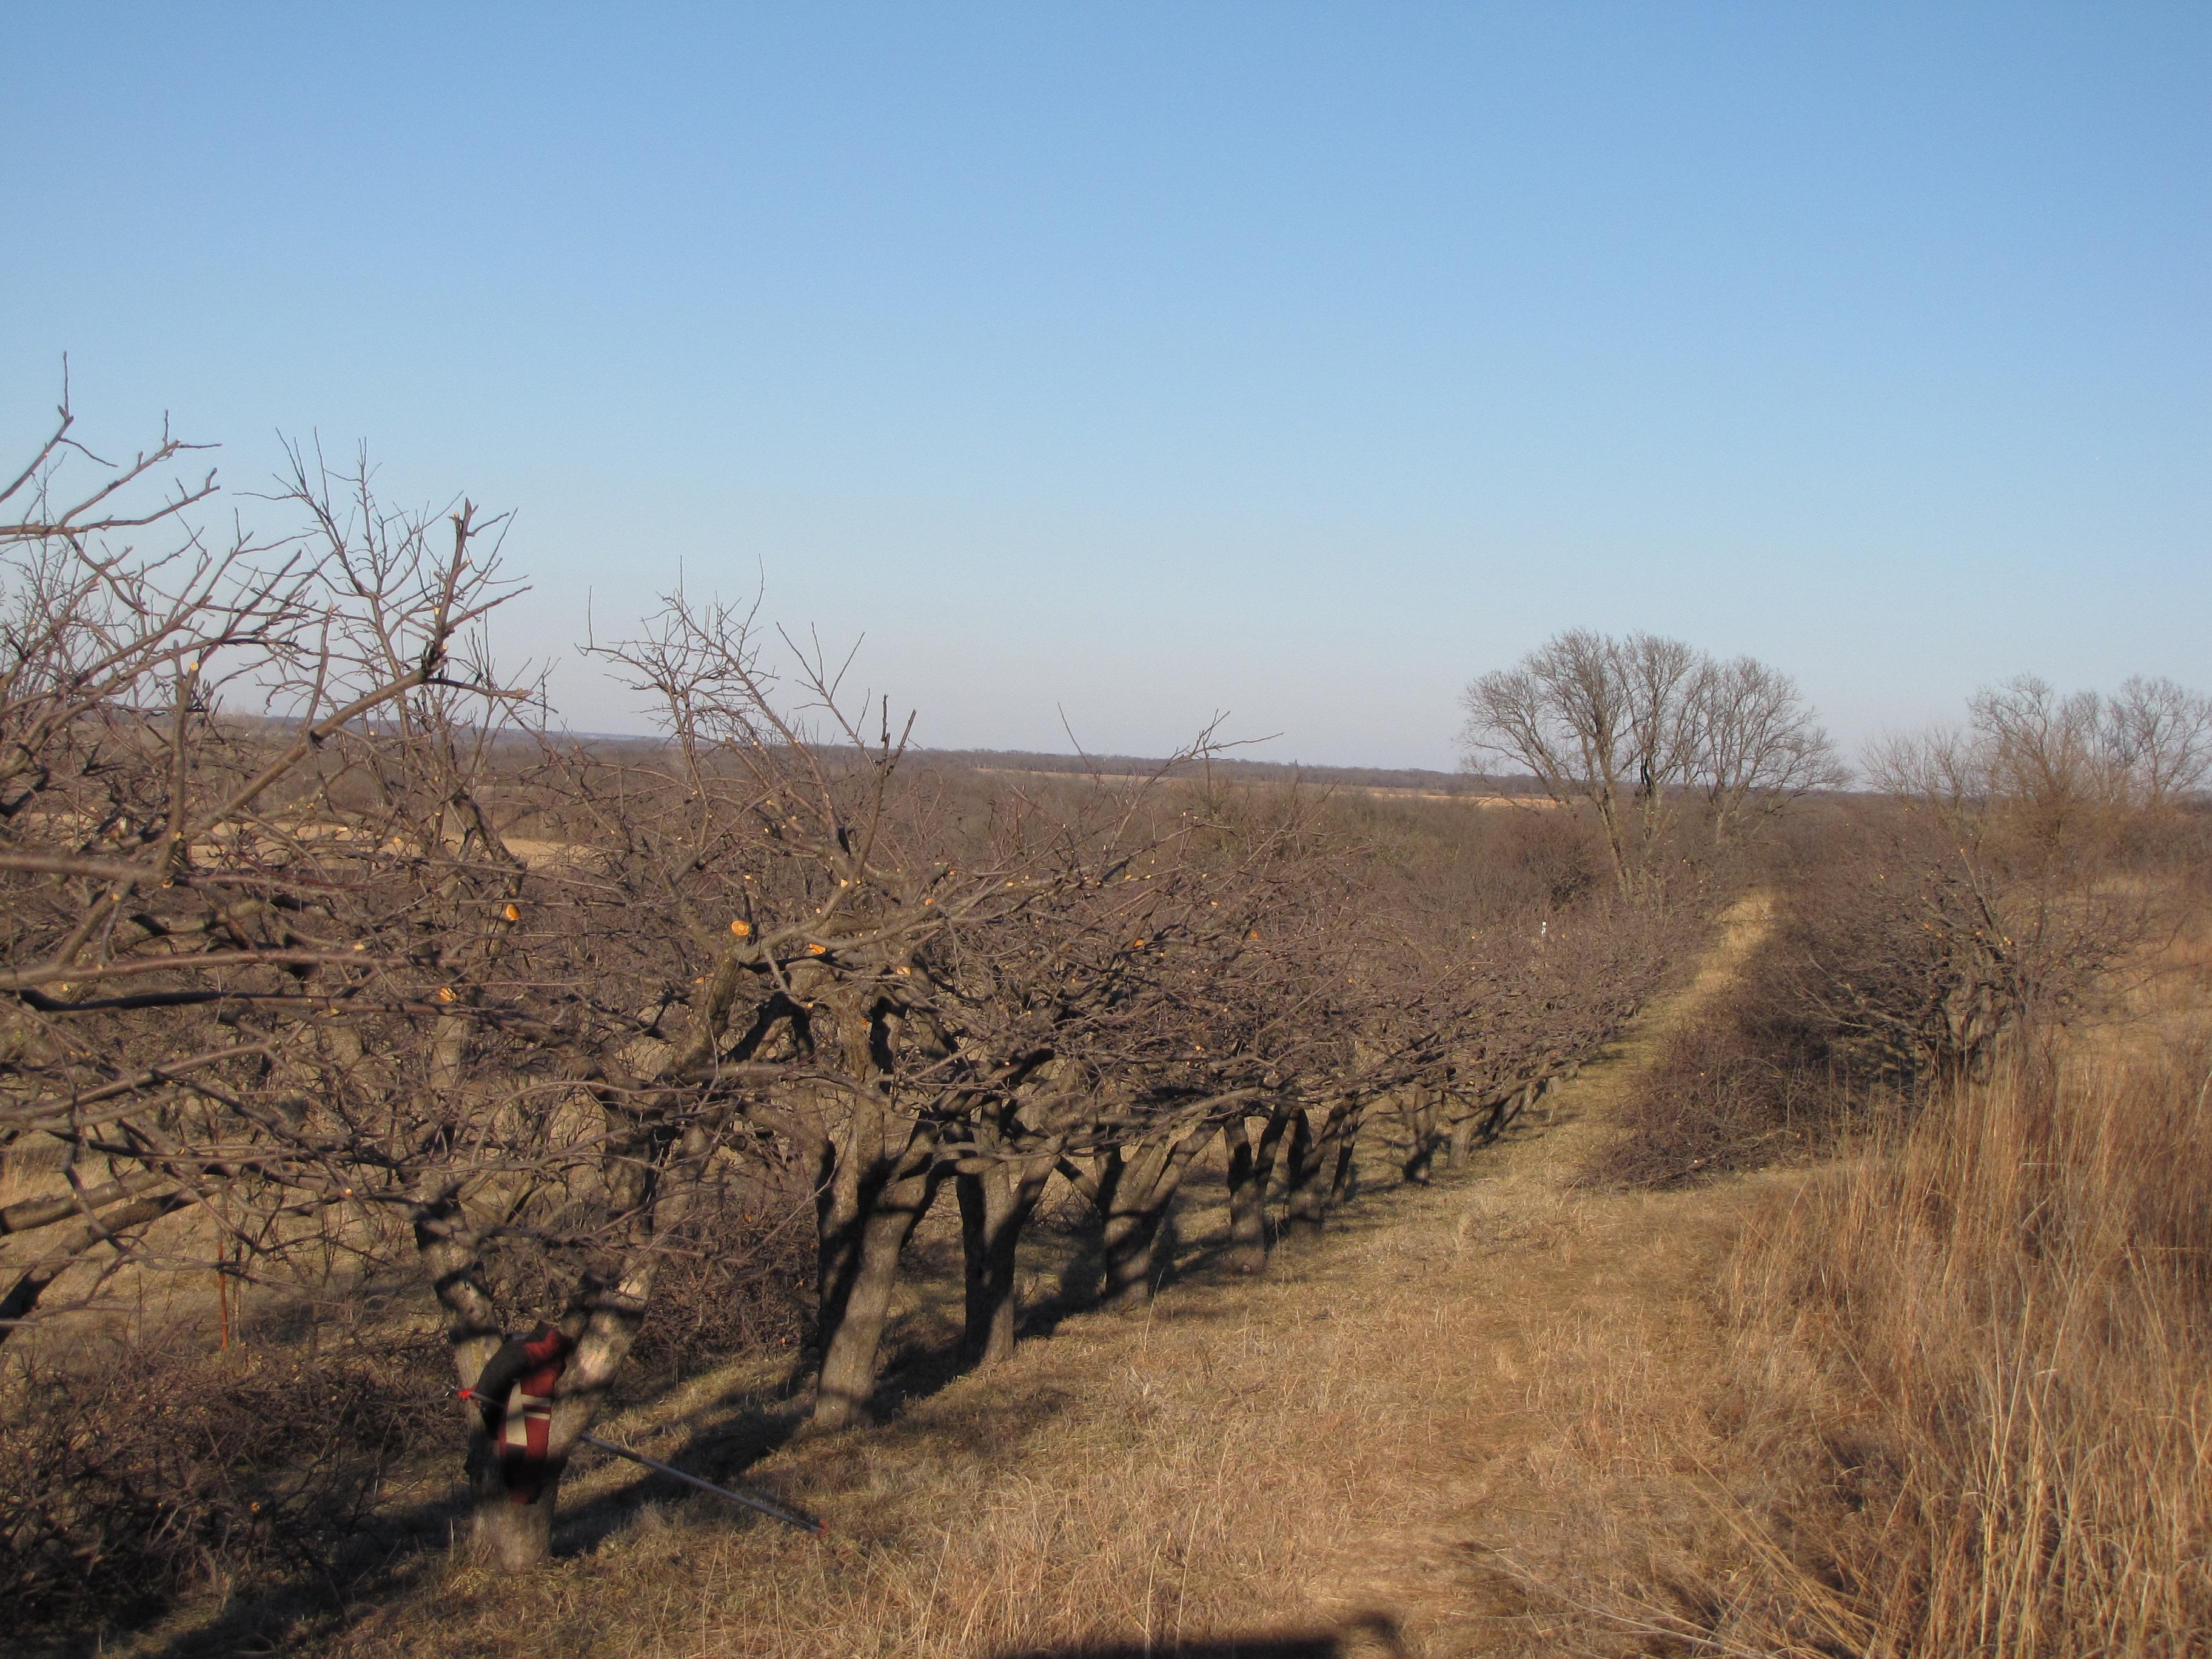 Prunned Apple Trees